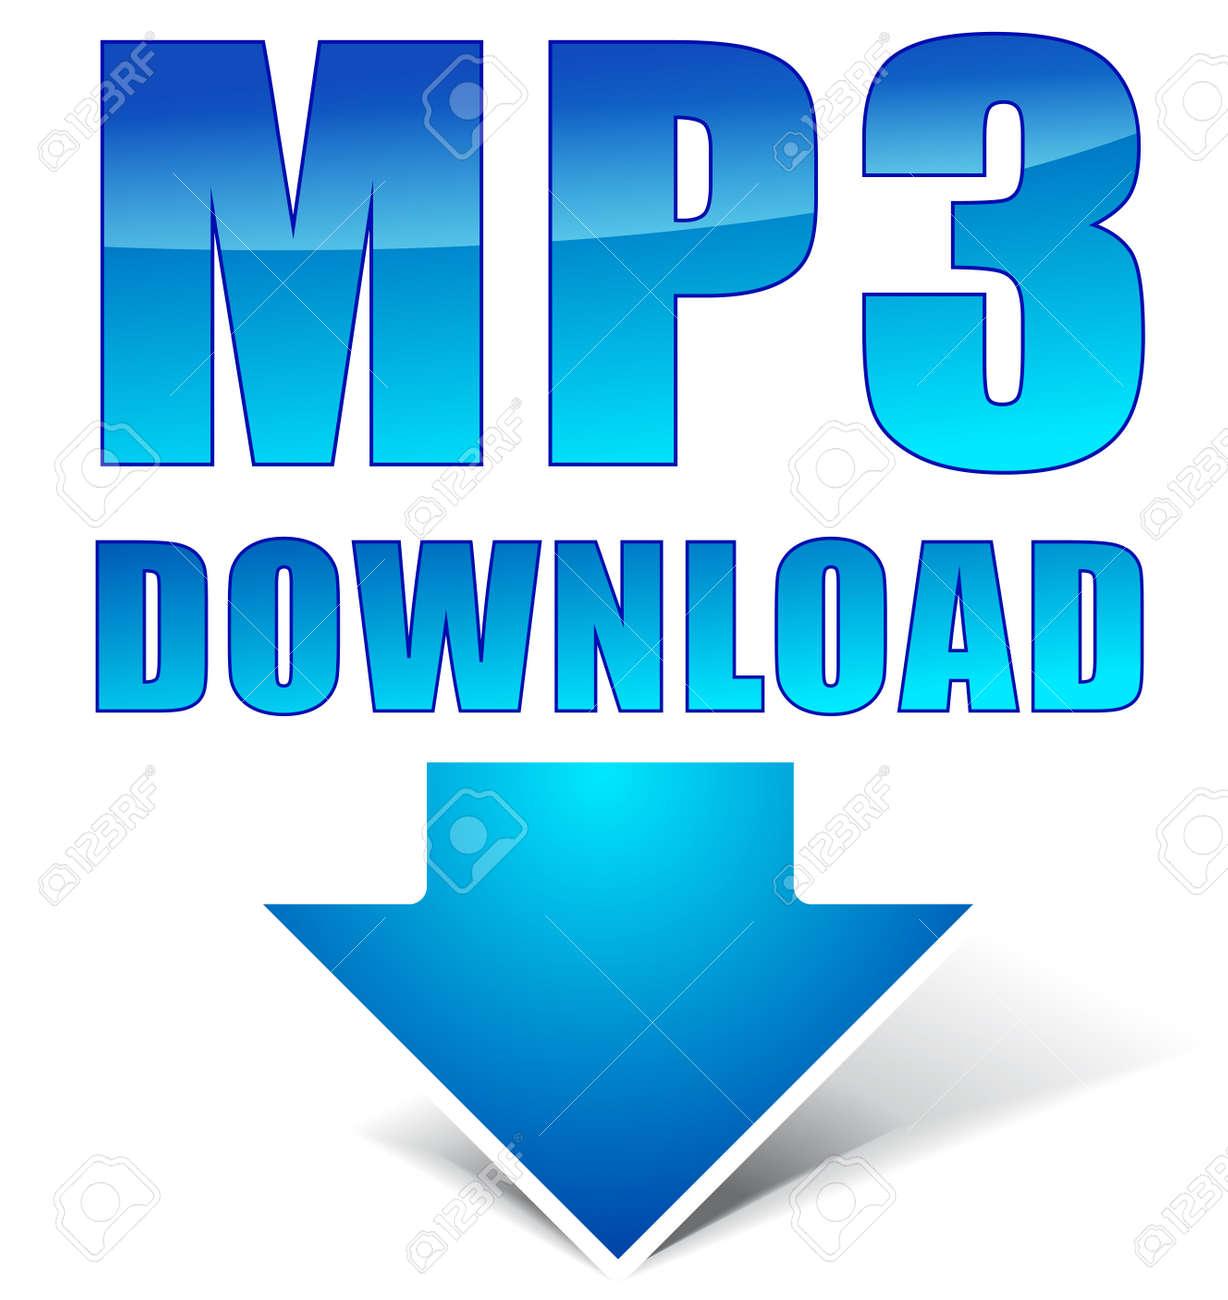 Downloading mp3 file